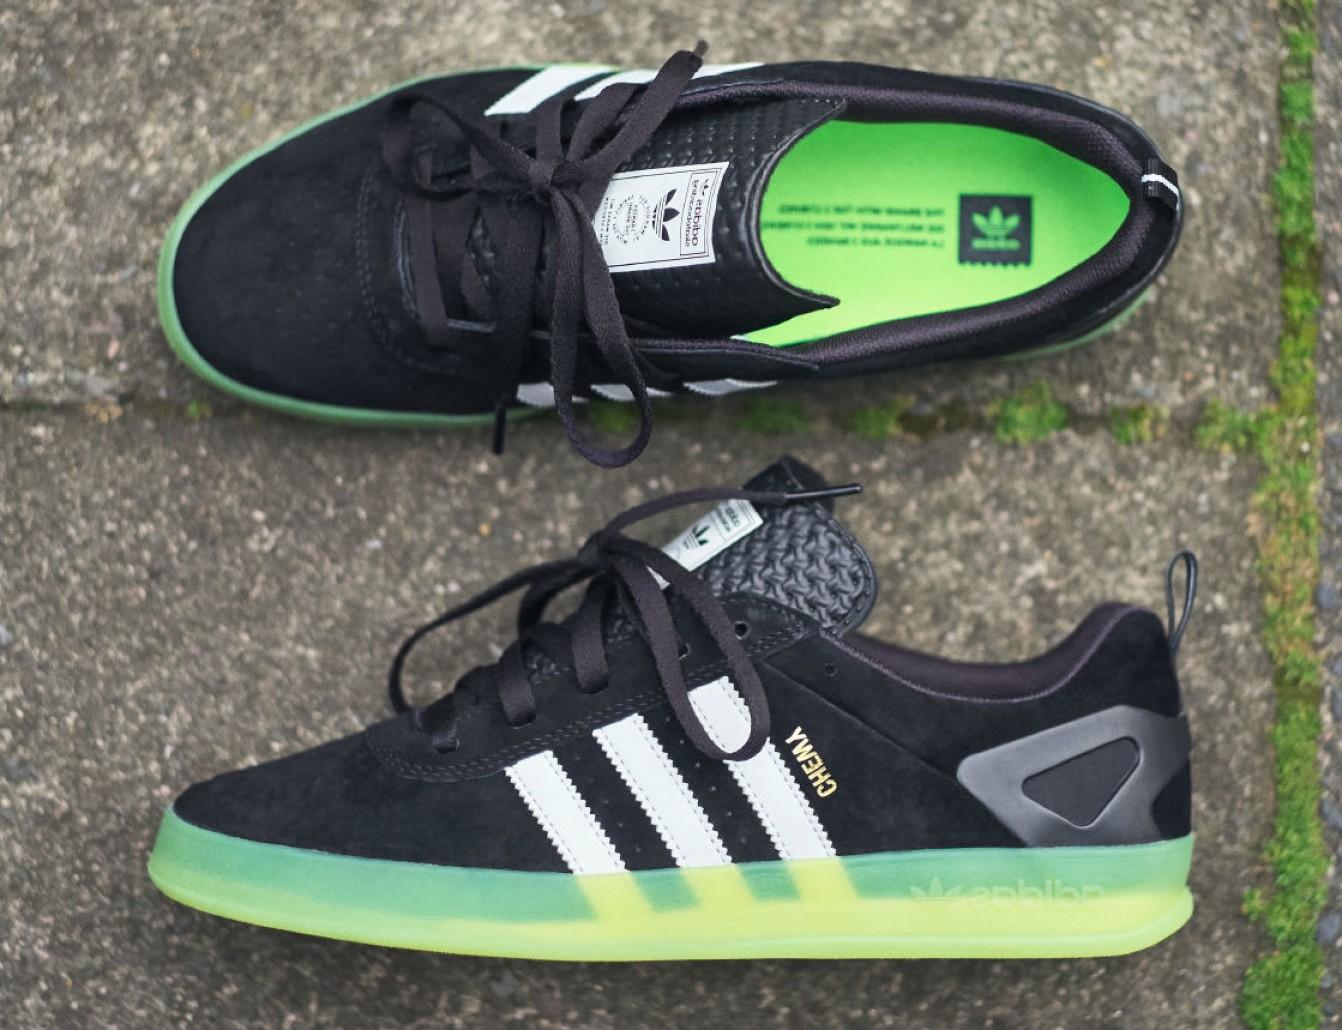 Clásico Autorización Varios  Adidas Adidas Palace Pro (chewy) | Grailed